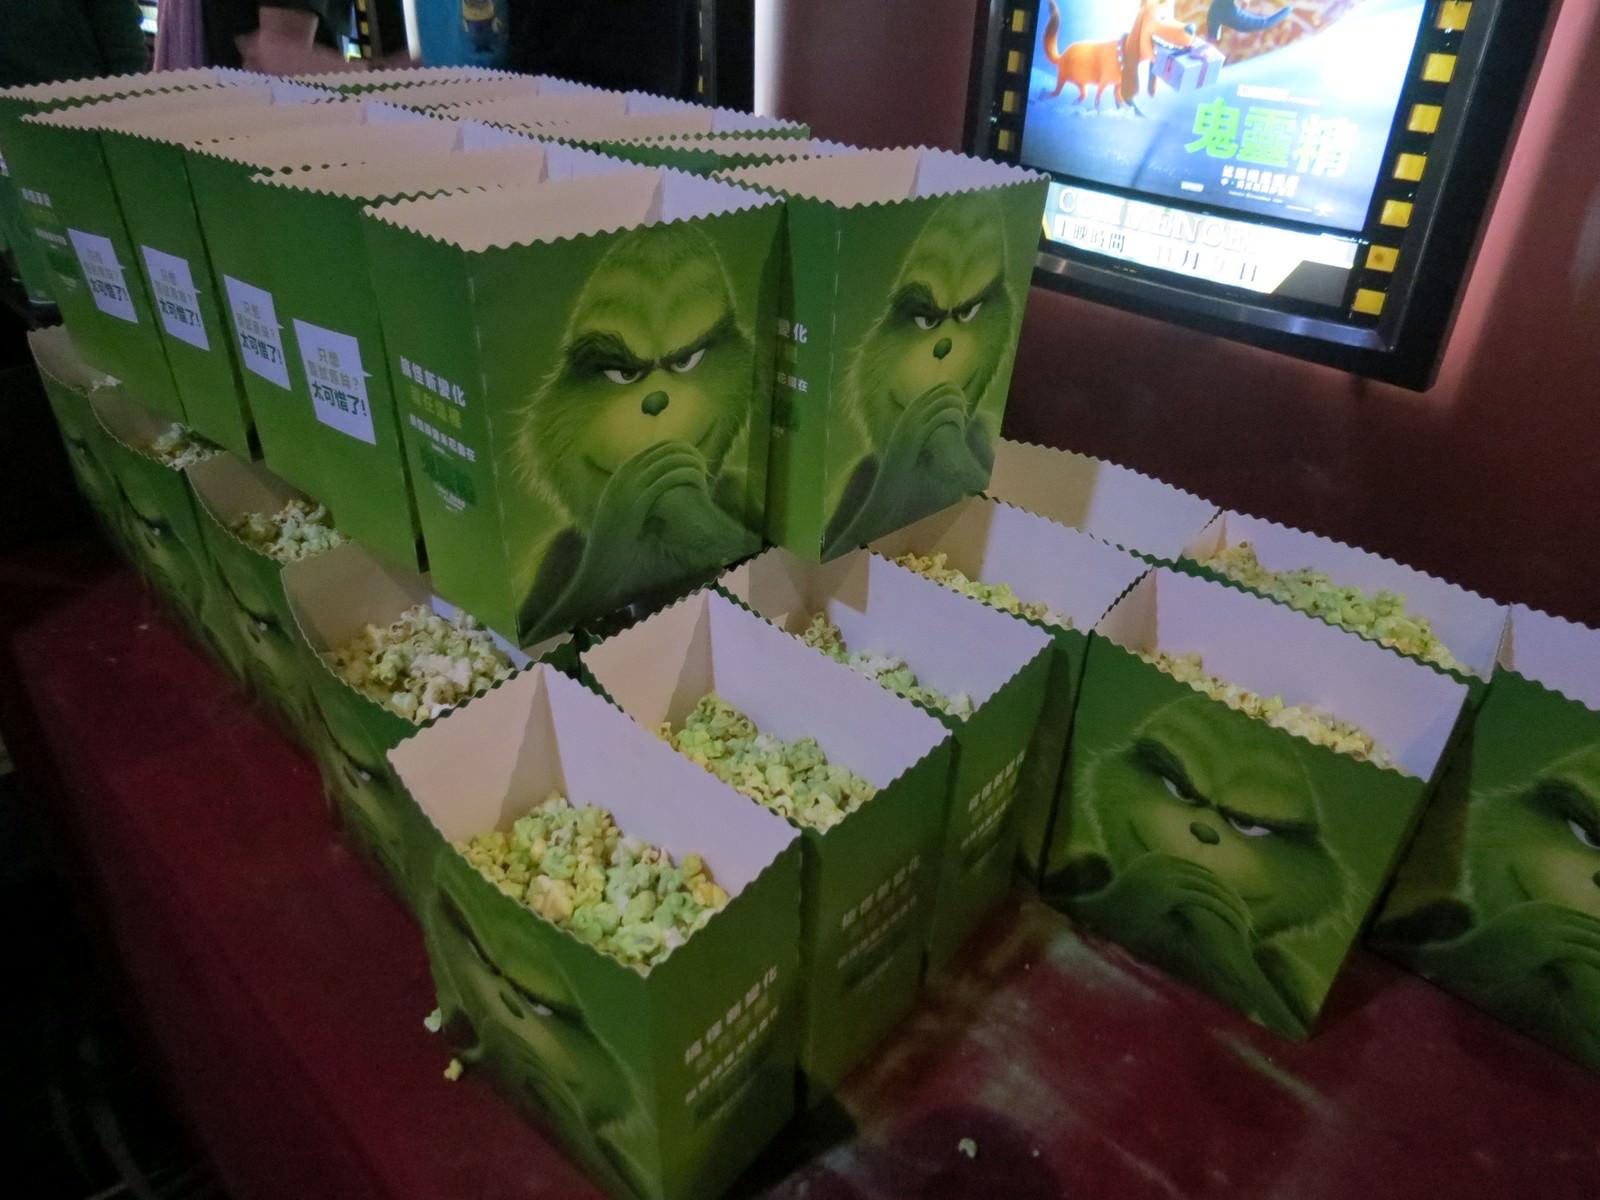 Movie, The Grinch(美國, 2018年) / 鬼靈精(台灣) / 绿毛怪格林奇(中國) / 聖誕怪怪傑(香港), 特映會現場, 爆米花